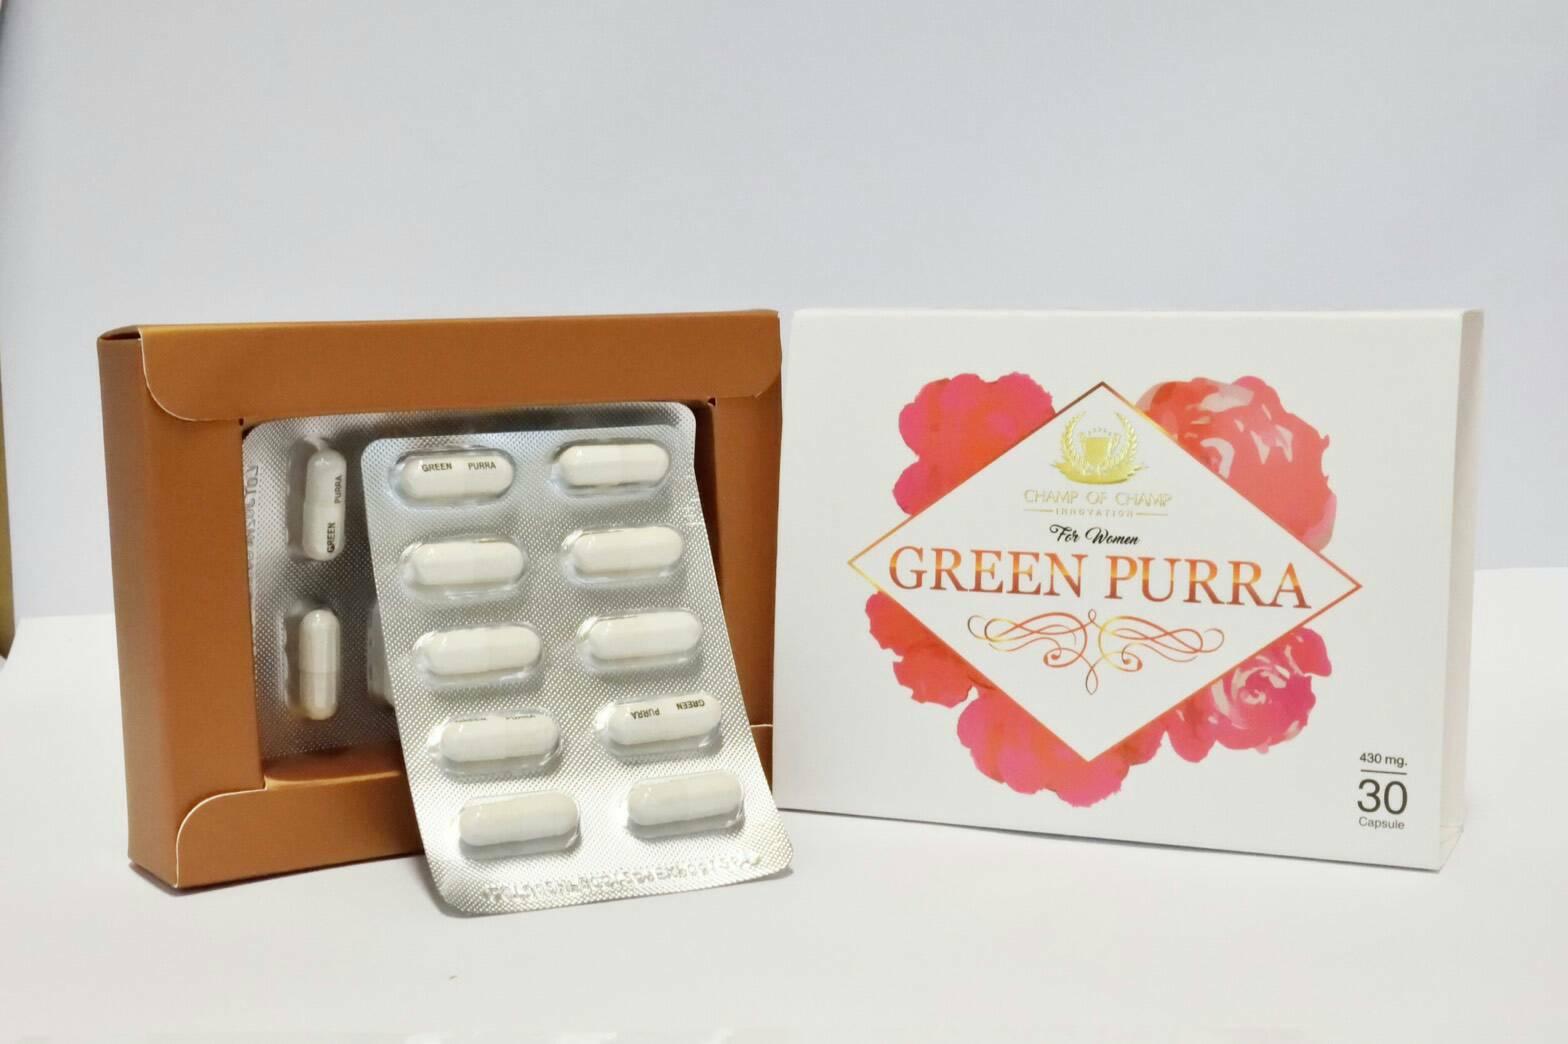 GREEN PURRA กรีน เพอร่า อาหารเสริมผู้หญิง